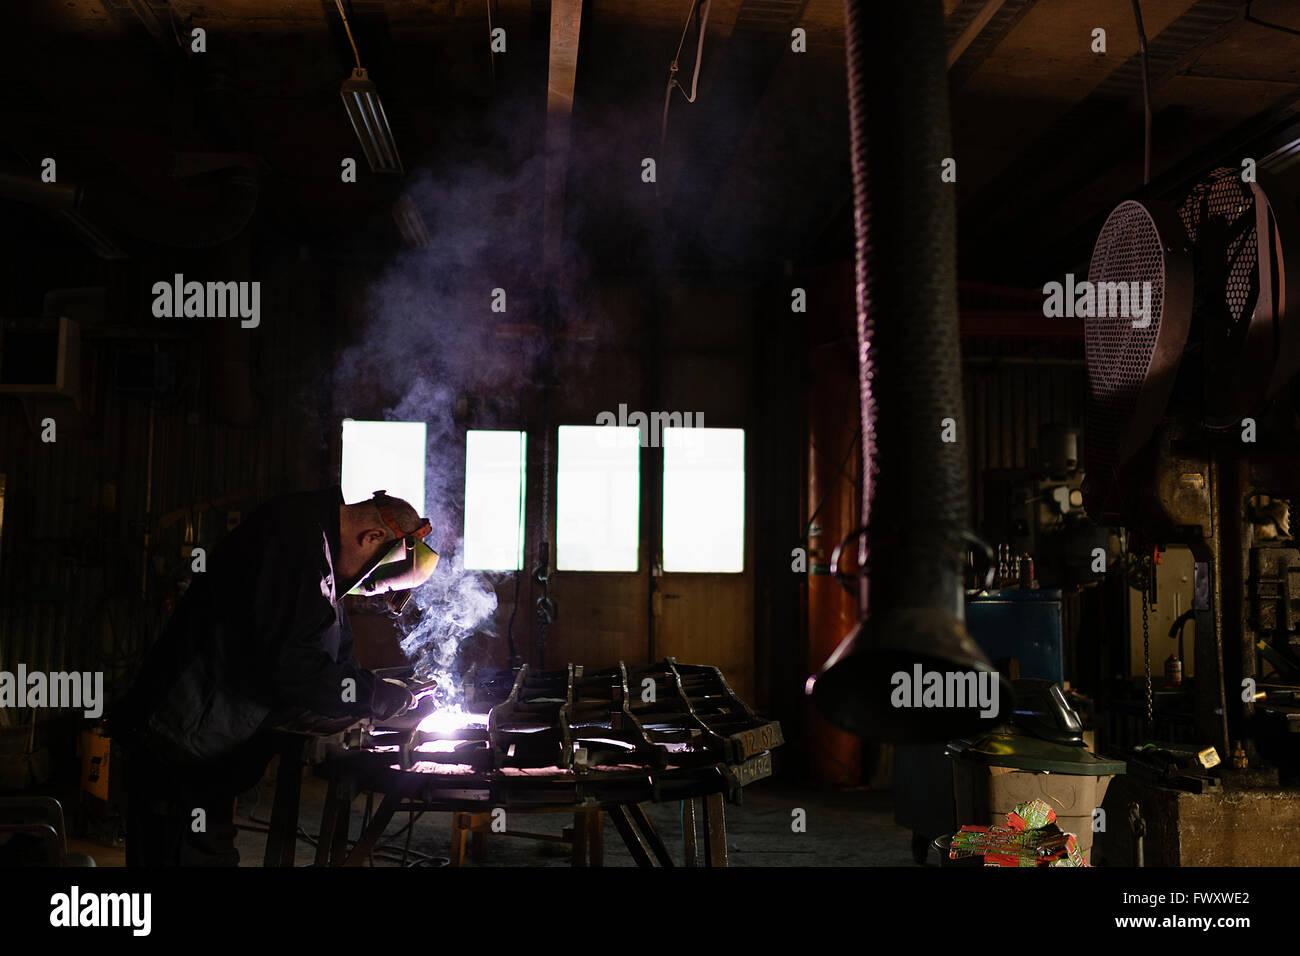 Sweden, Mature man welding construction frame - Stock Image